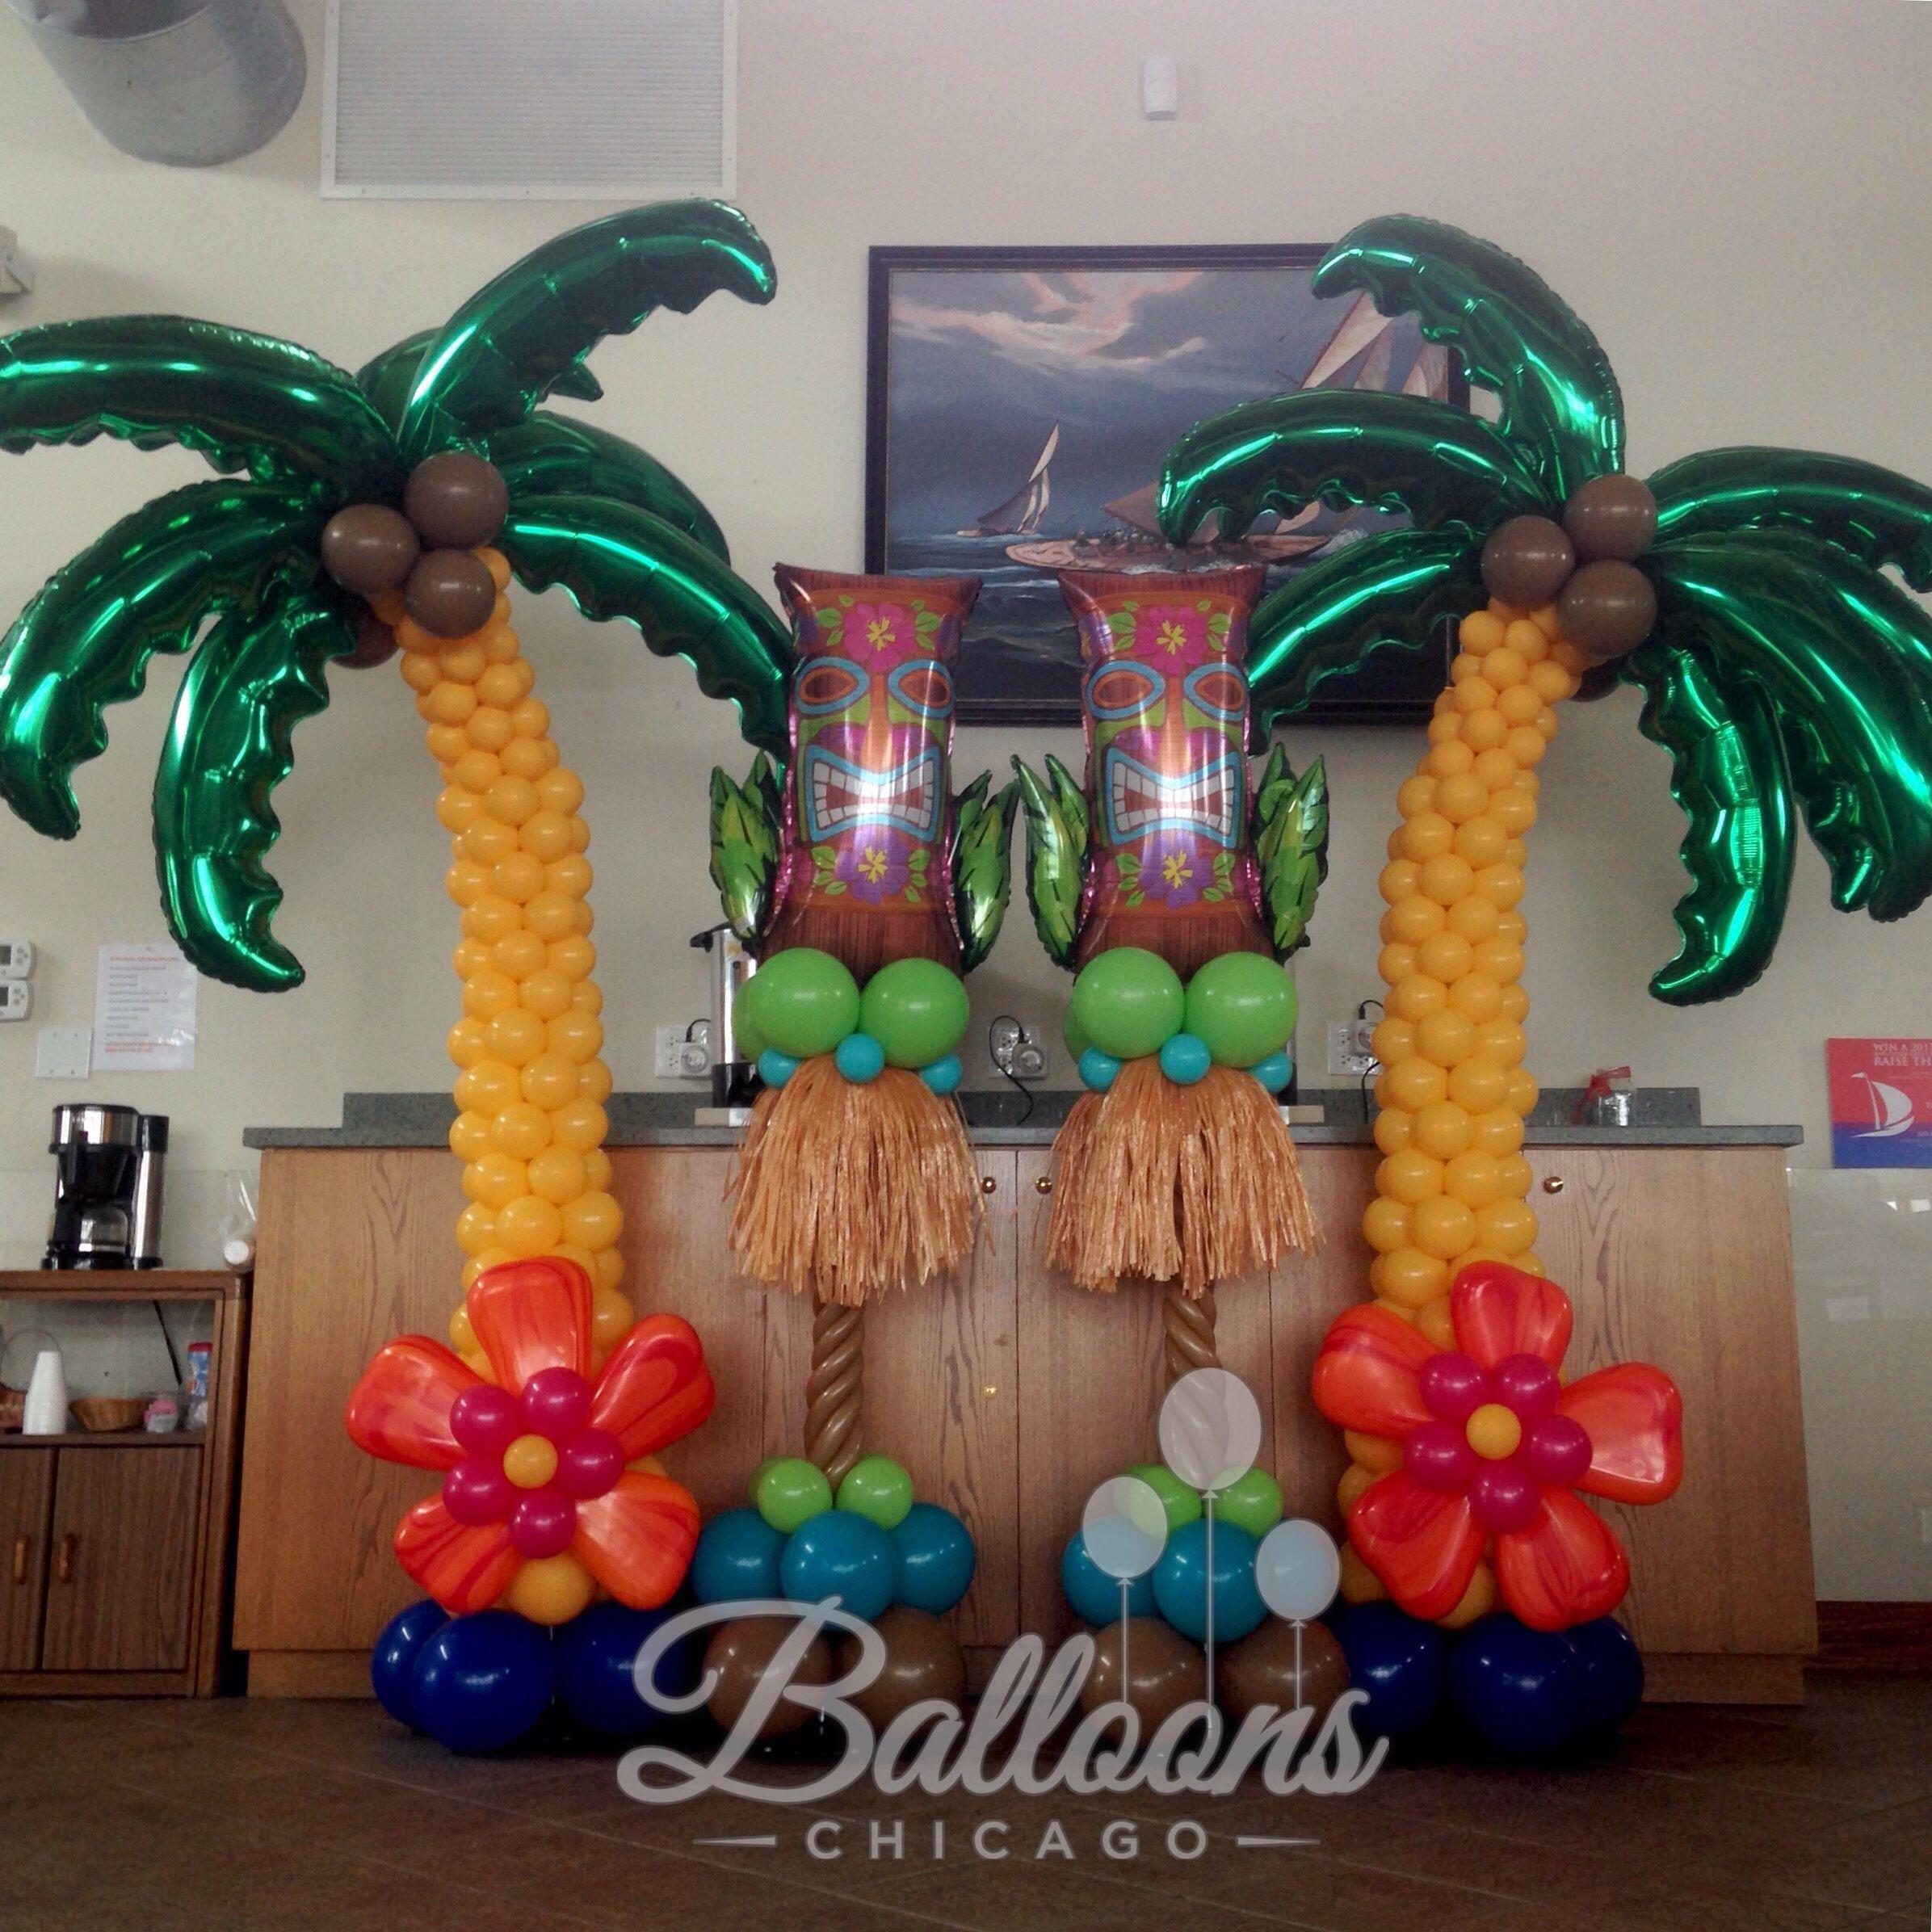 Luau Party He Cute Are These Tiki Guys So Fun Balloon Columns